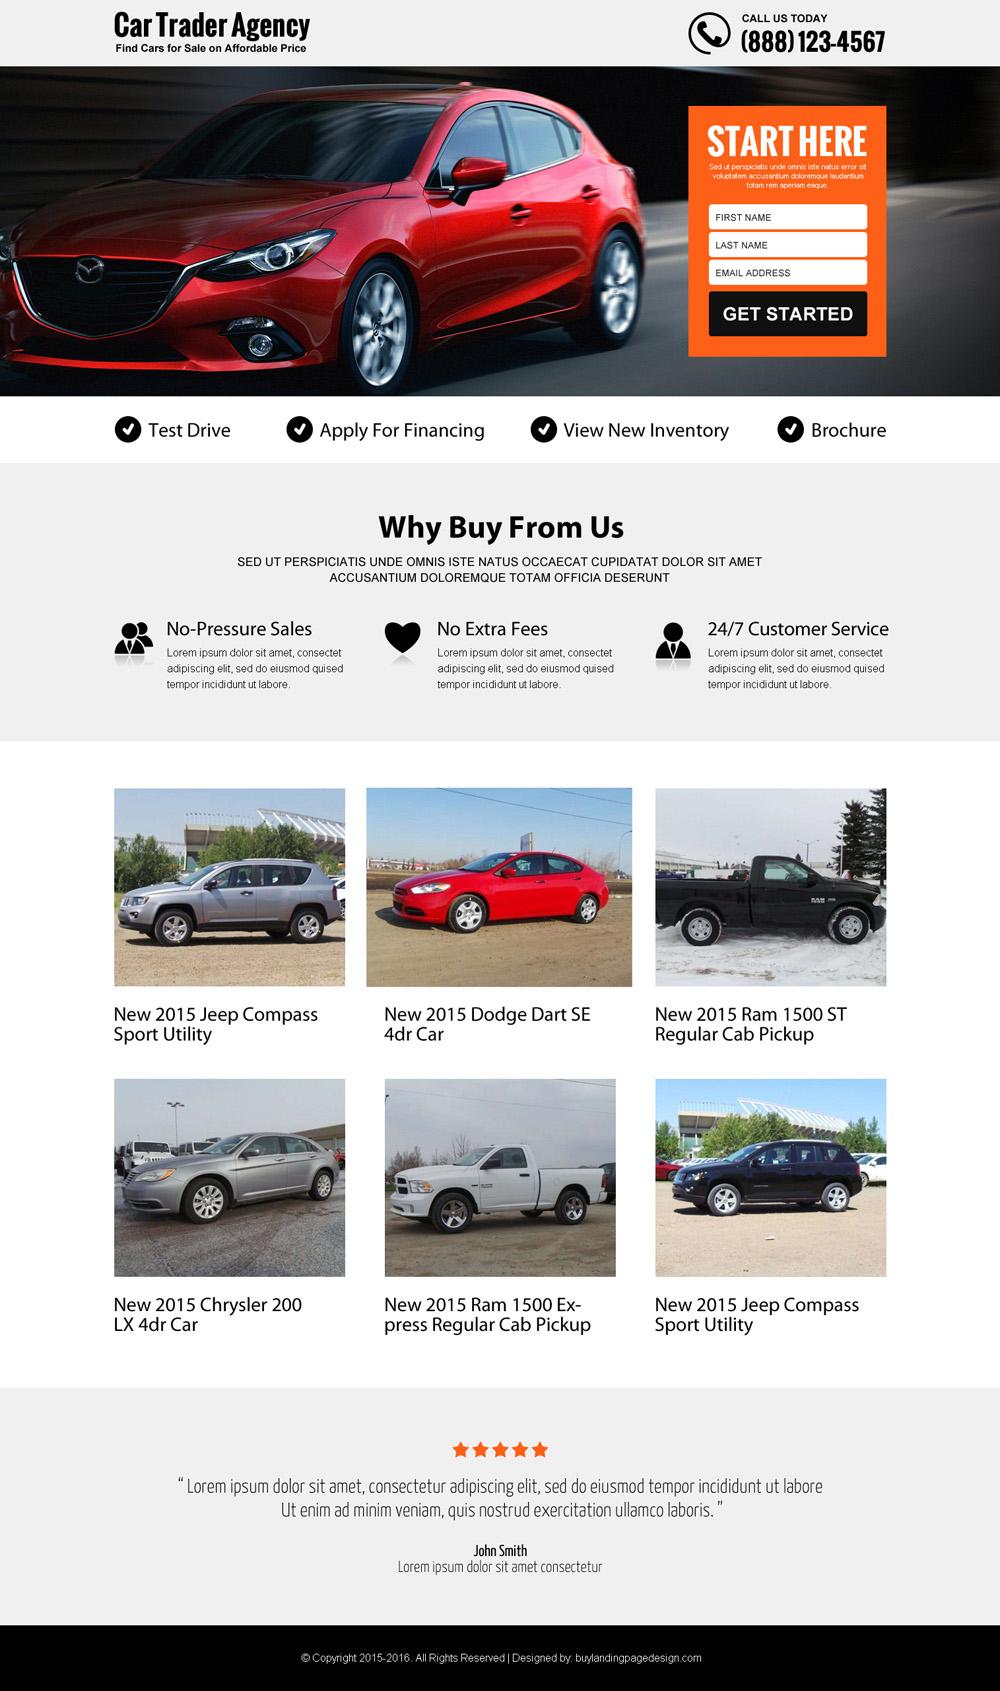 best-car-trading-agency-lead-generation-landing-page-design-003